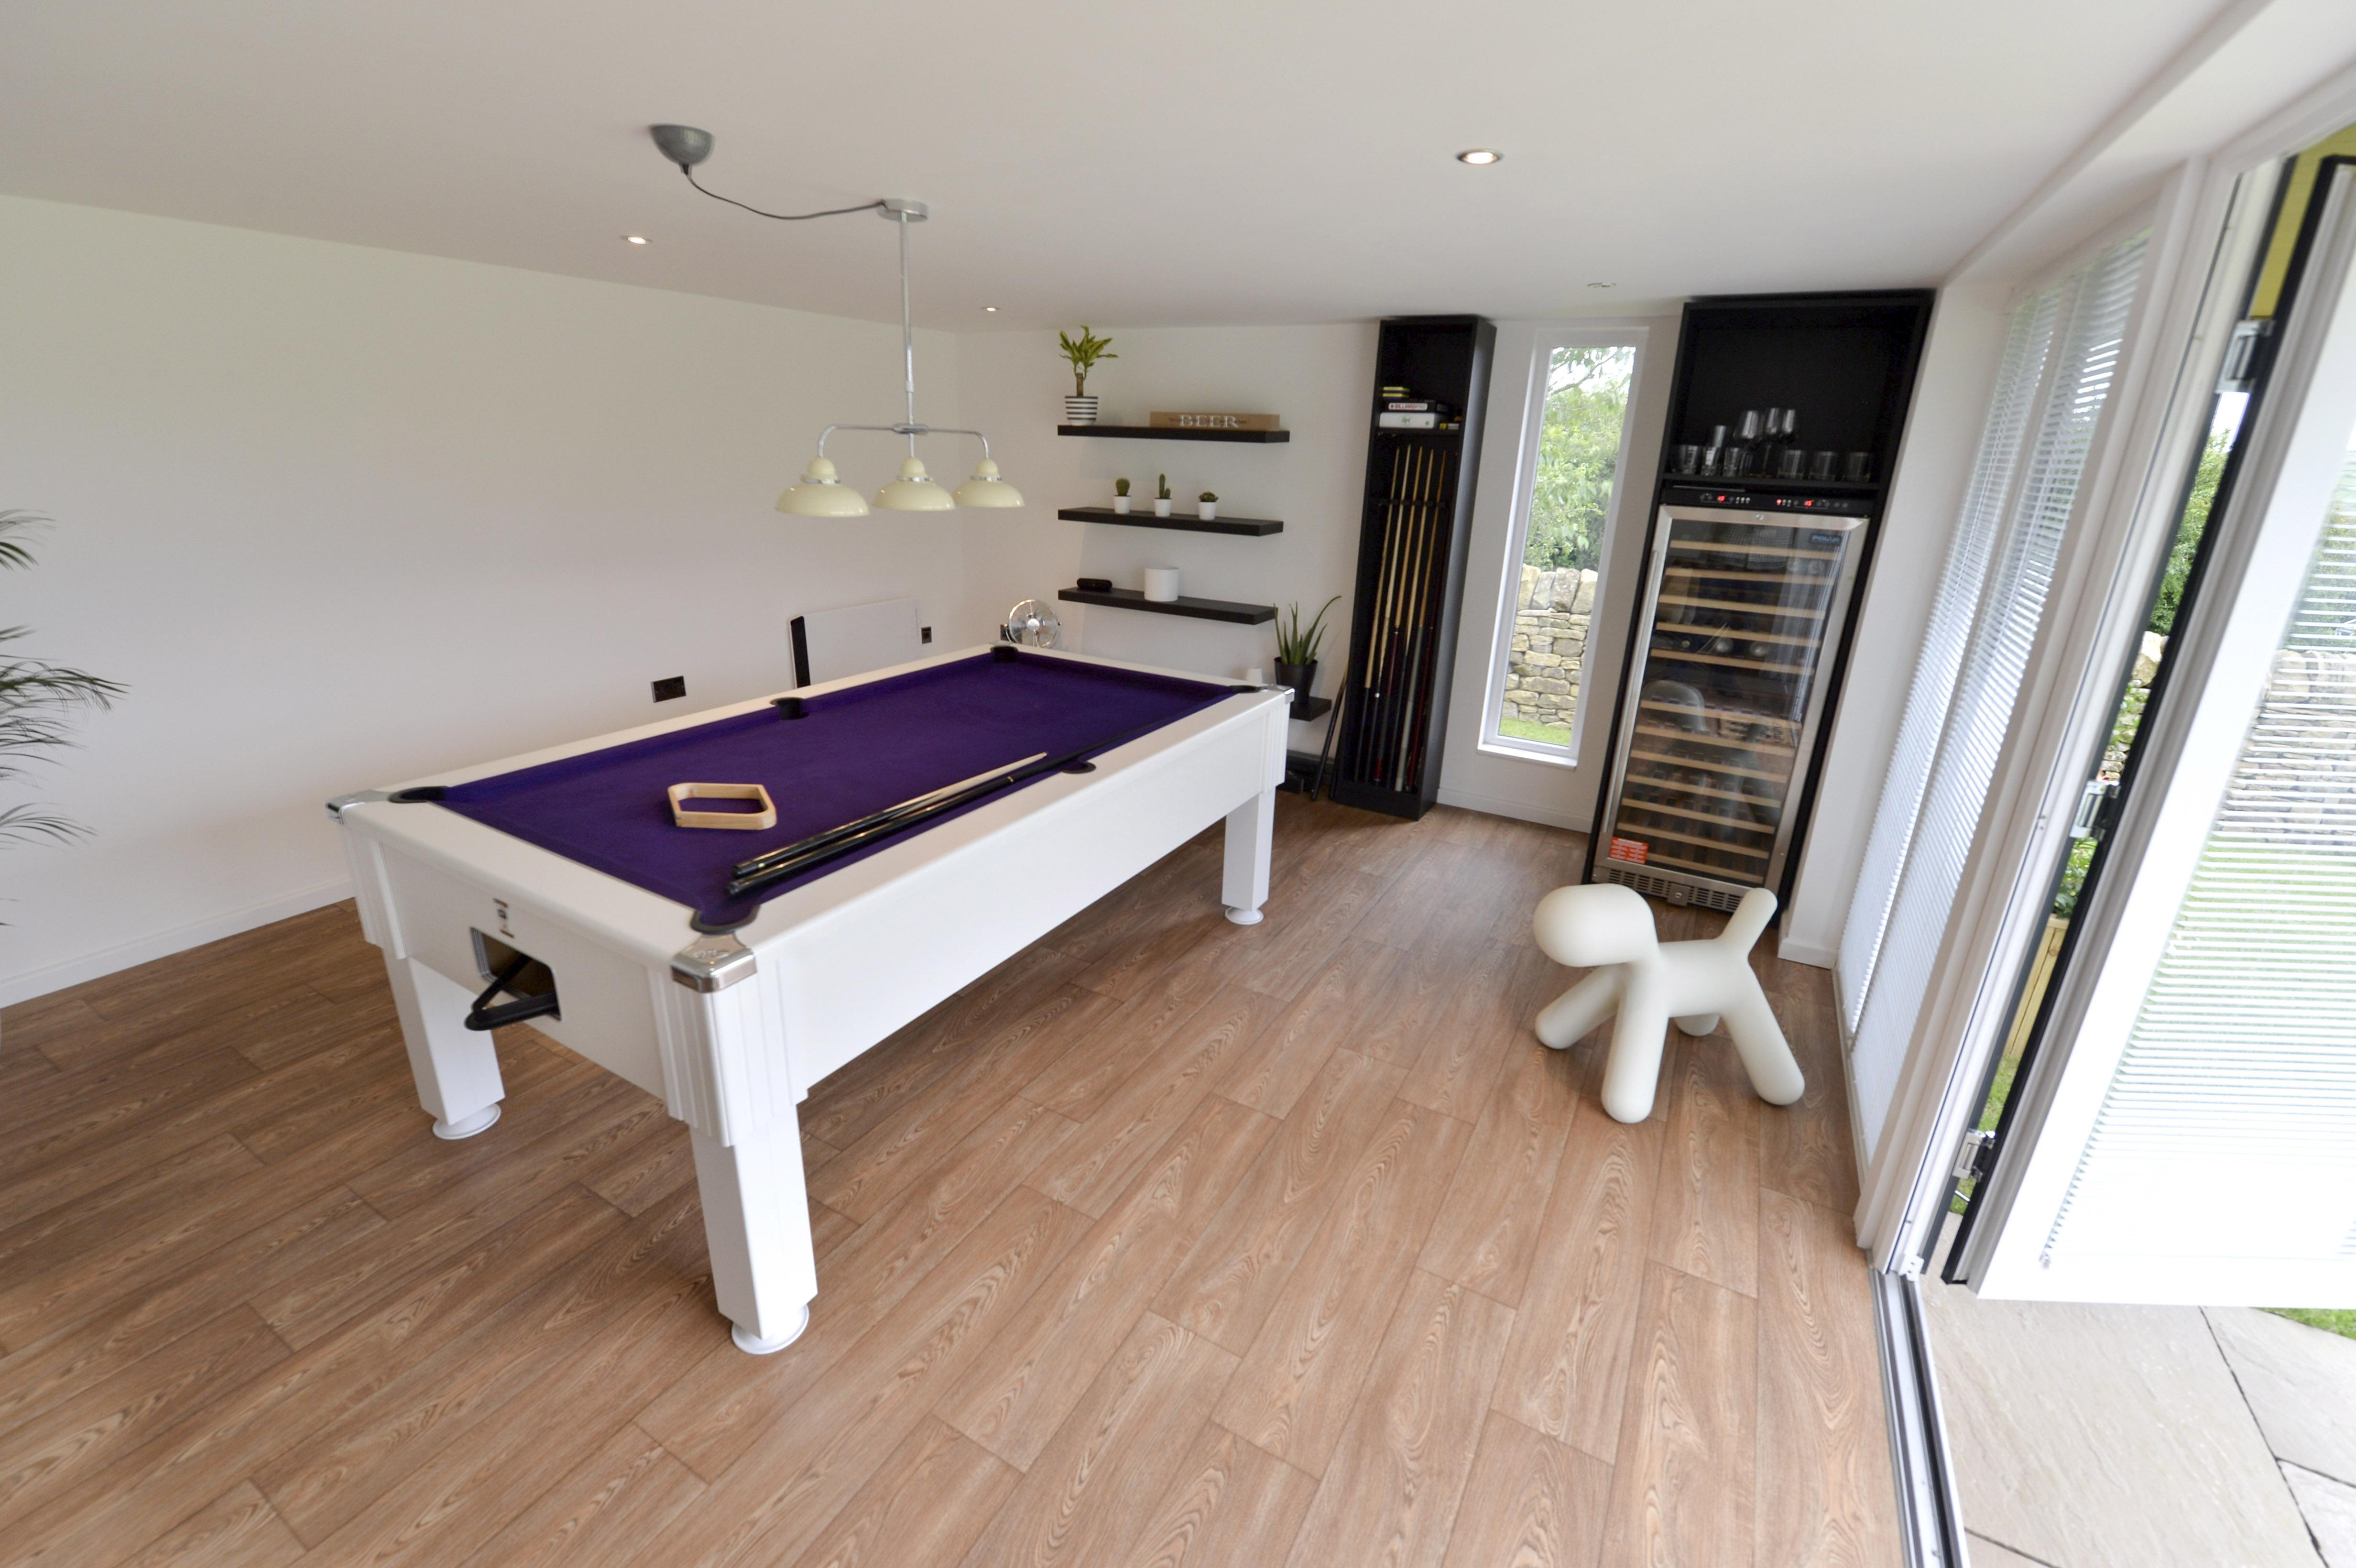 Garden rooms lifestyle for Your garden room